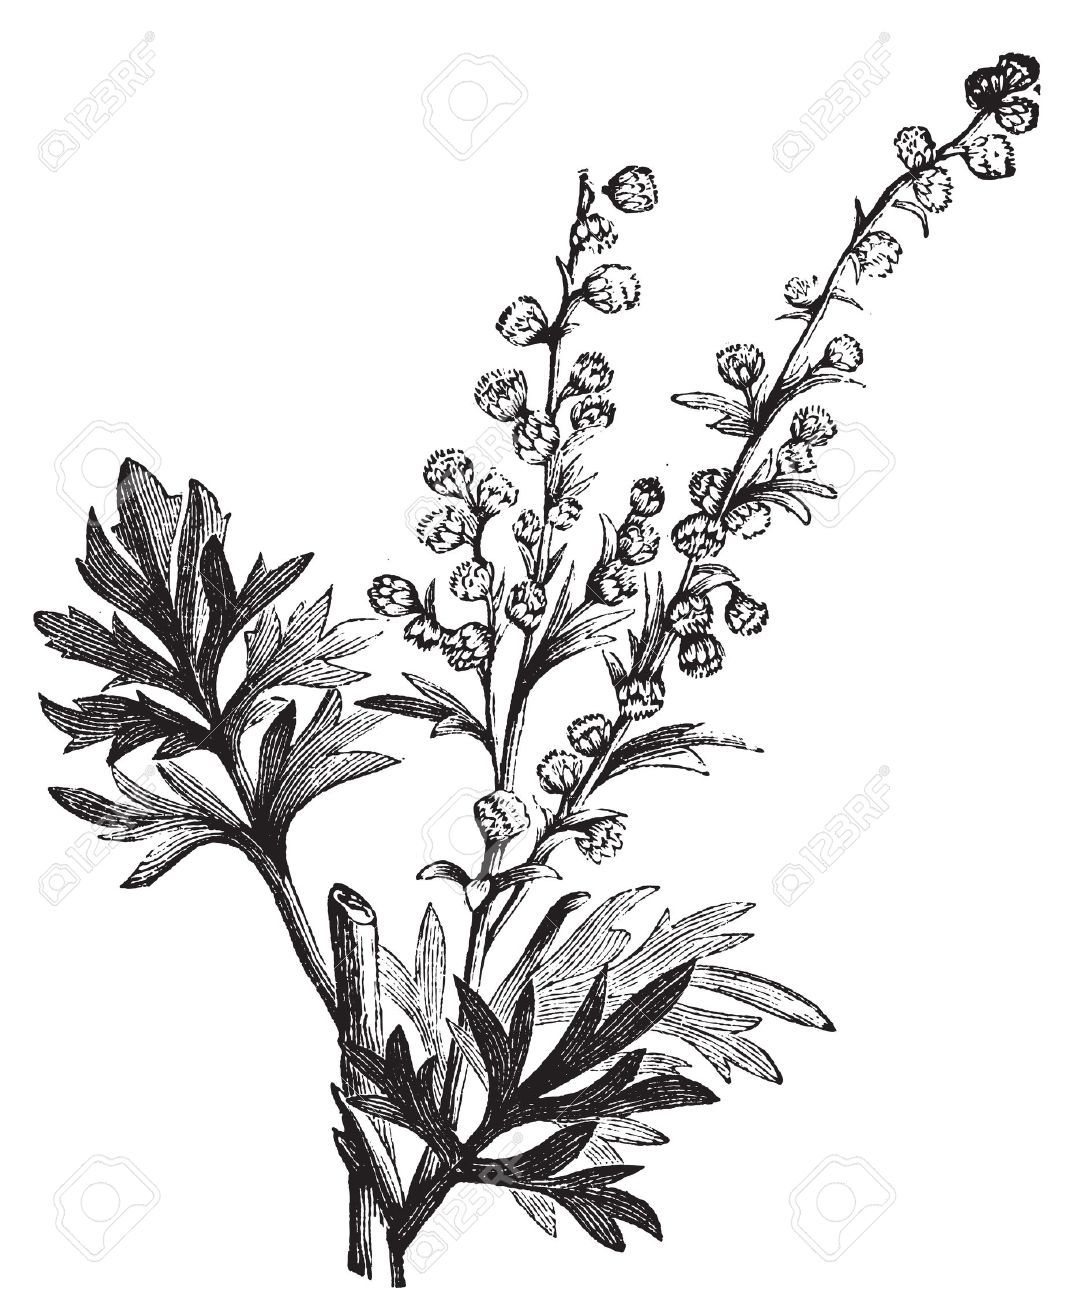 13770562-Absinthe-plant-Artemisia-absinthium-or-wormwood-engraving-illustration--Stock-Photo.jpg 1.074×1.300 piksel